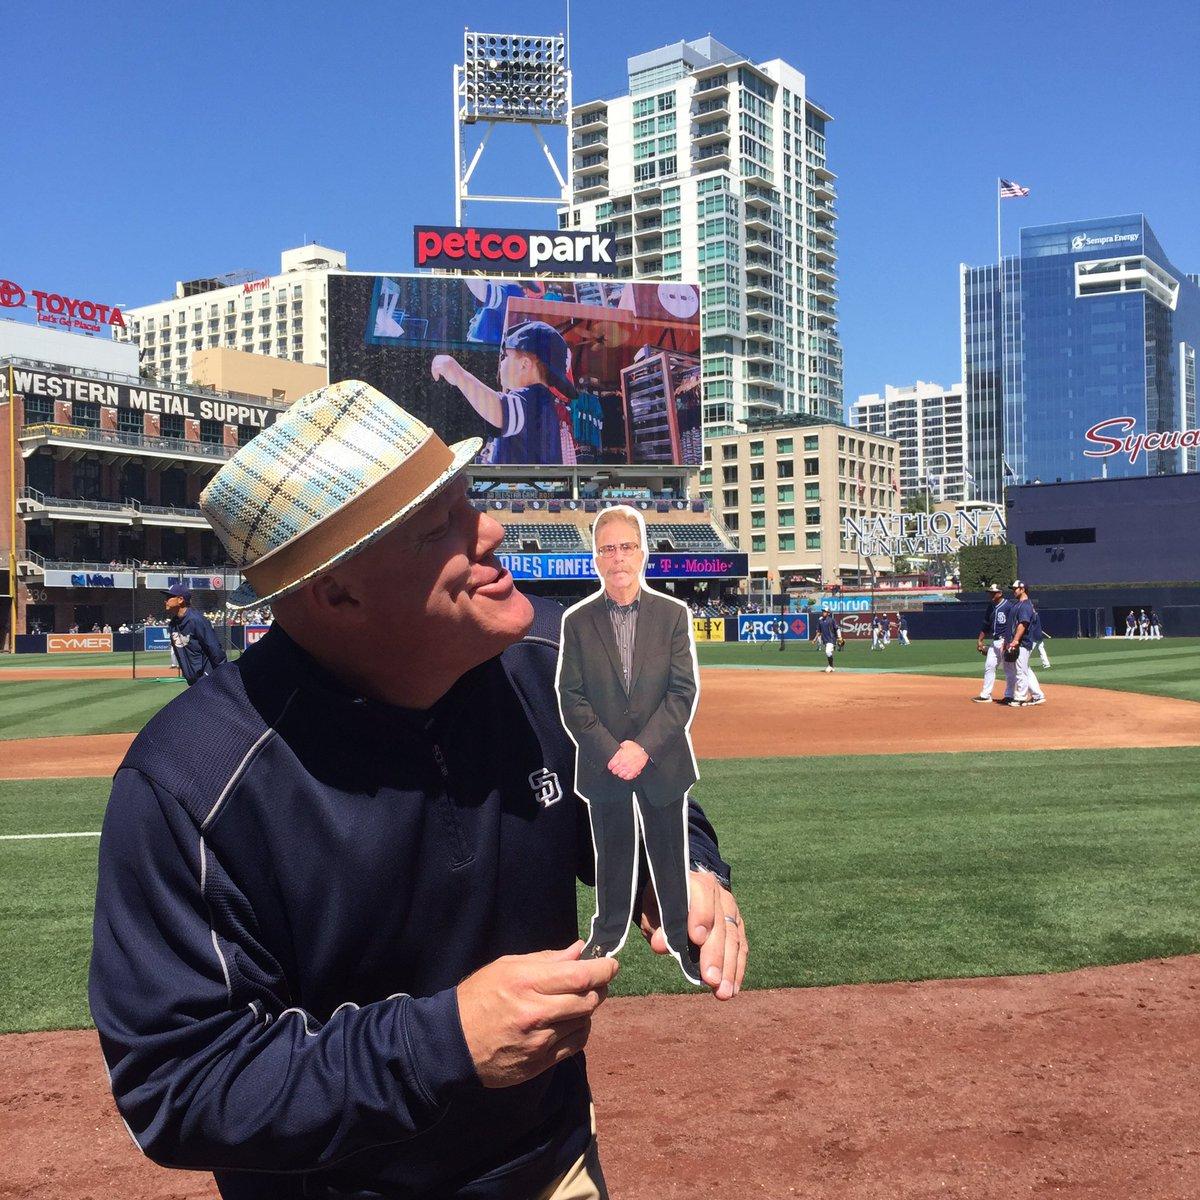 RT @ThreeBZine: #FlatRonnie spending his day at @Padres FanFest today w/ @Mudcat55! Hey Now! @sternshow @rmlimodriver69 #SternShow https://…